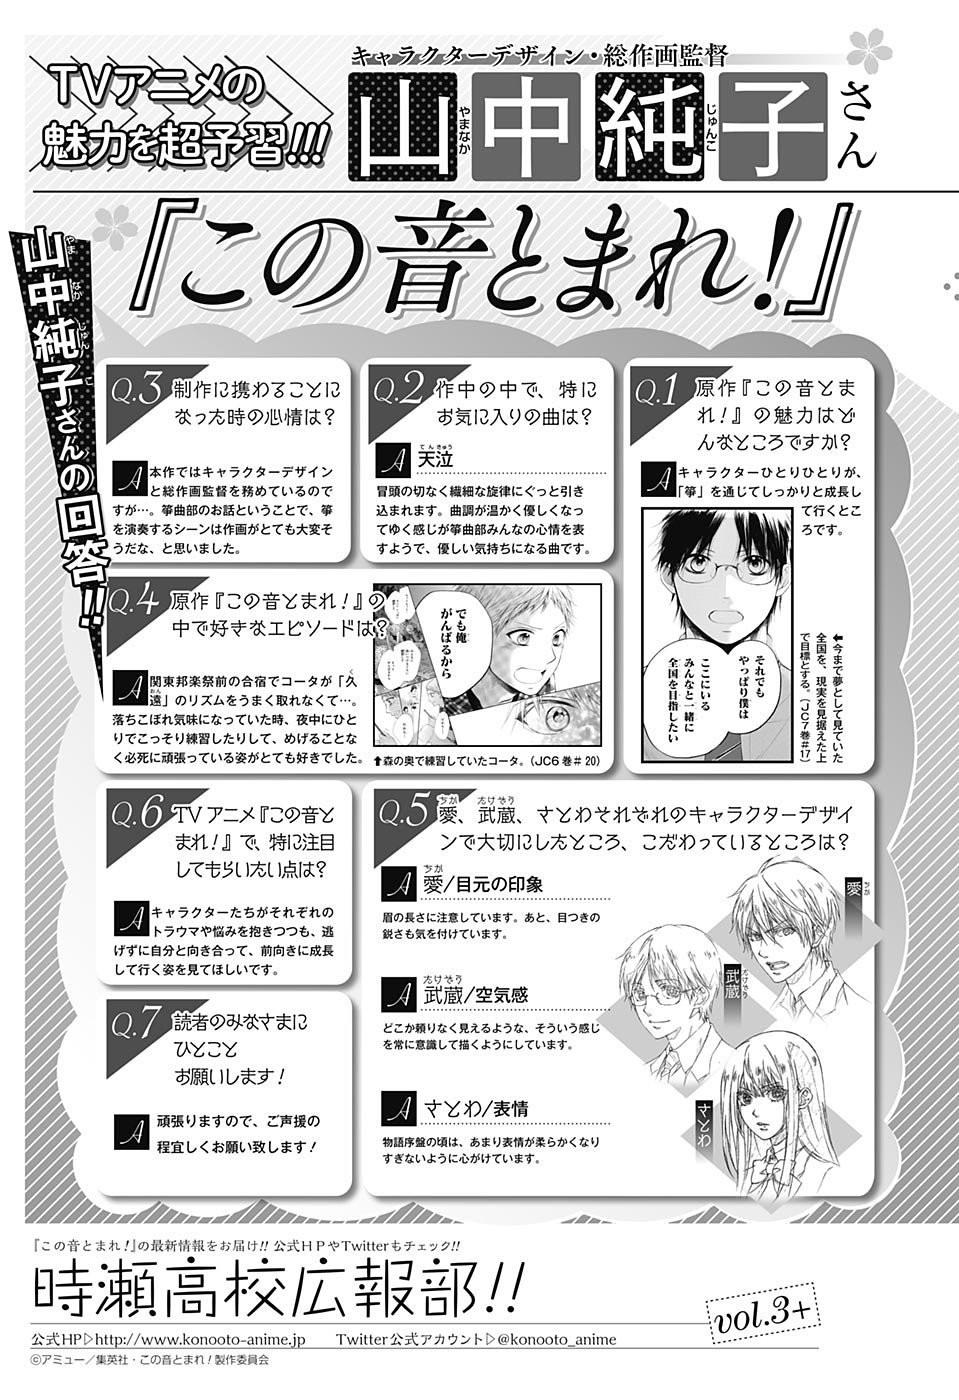 Kono Oto Tomare! - Chapter 073 - Page 44